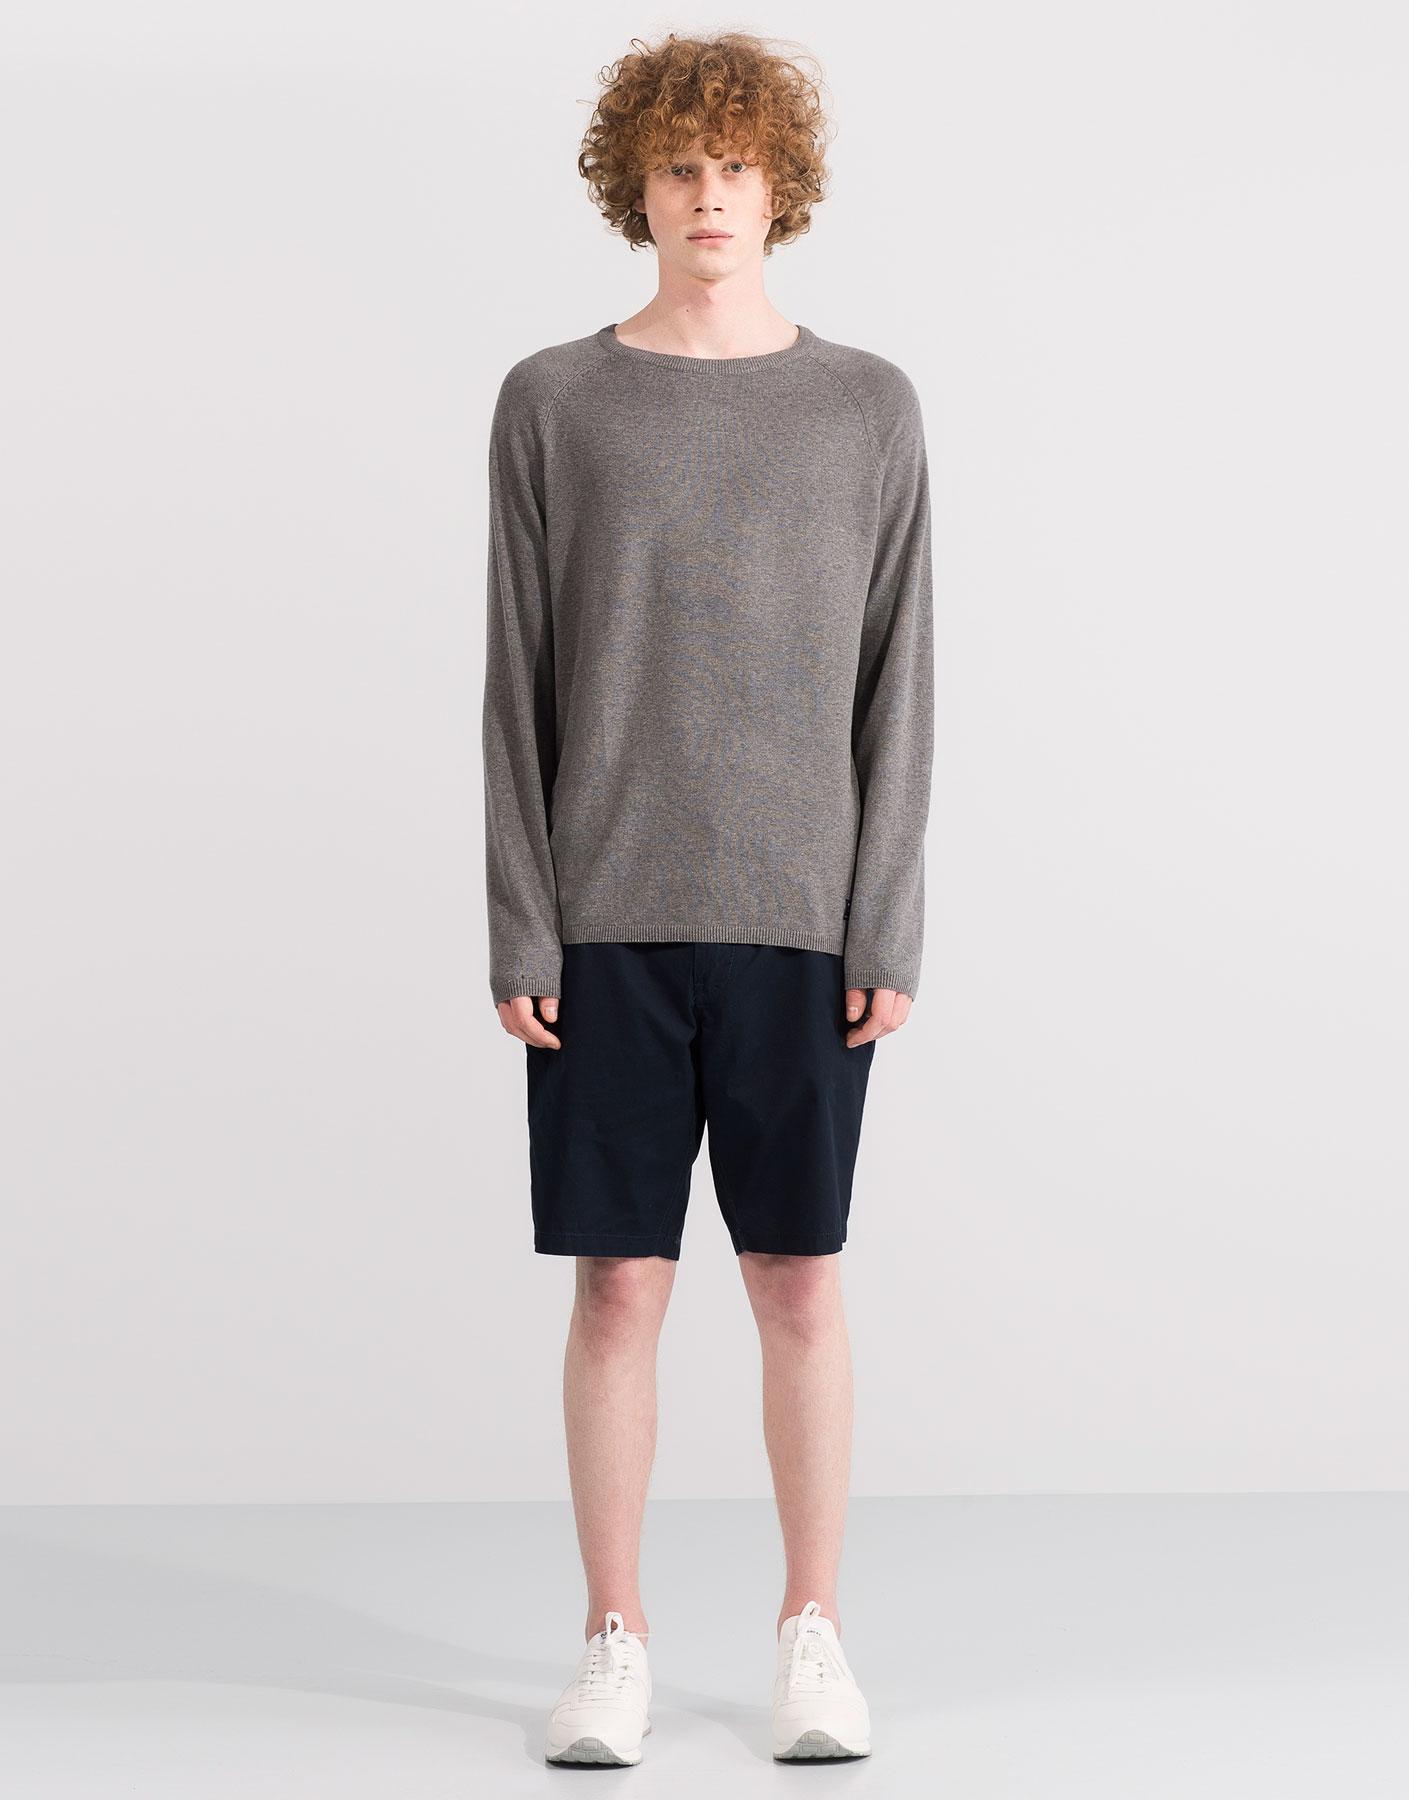 Basic blue sweater